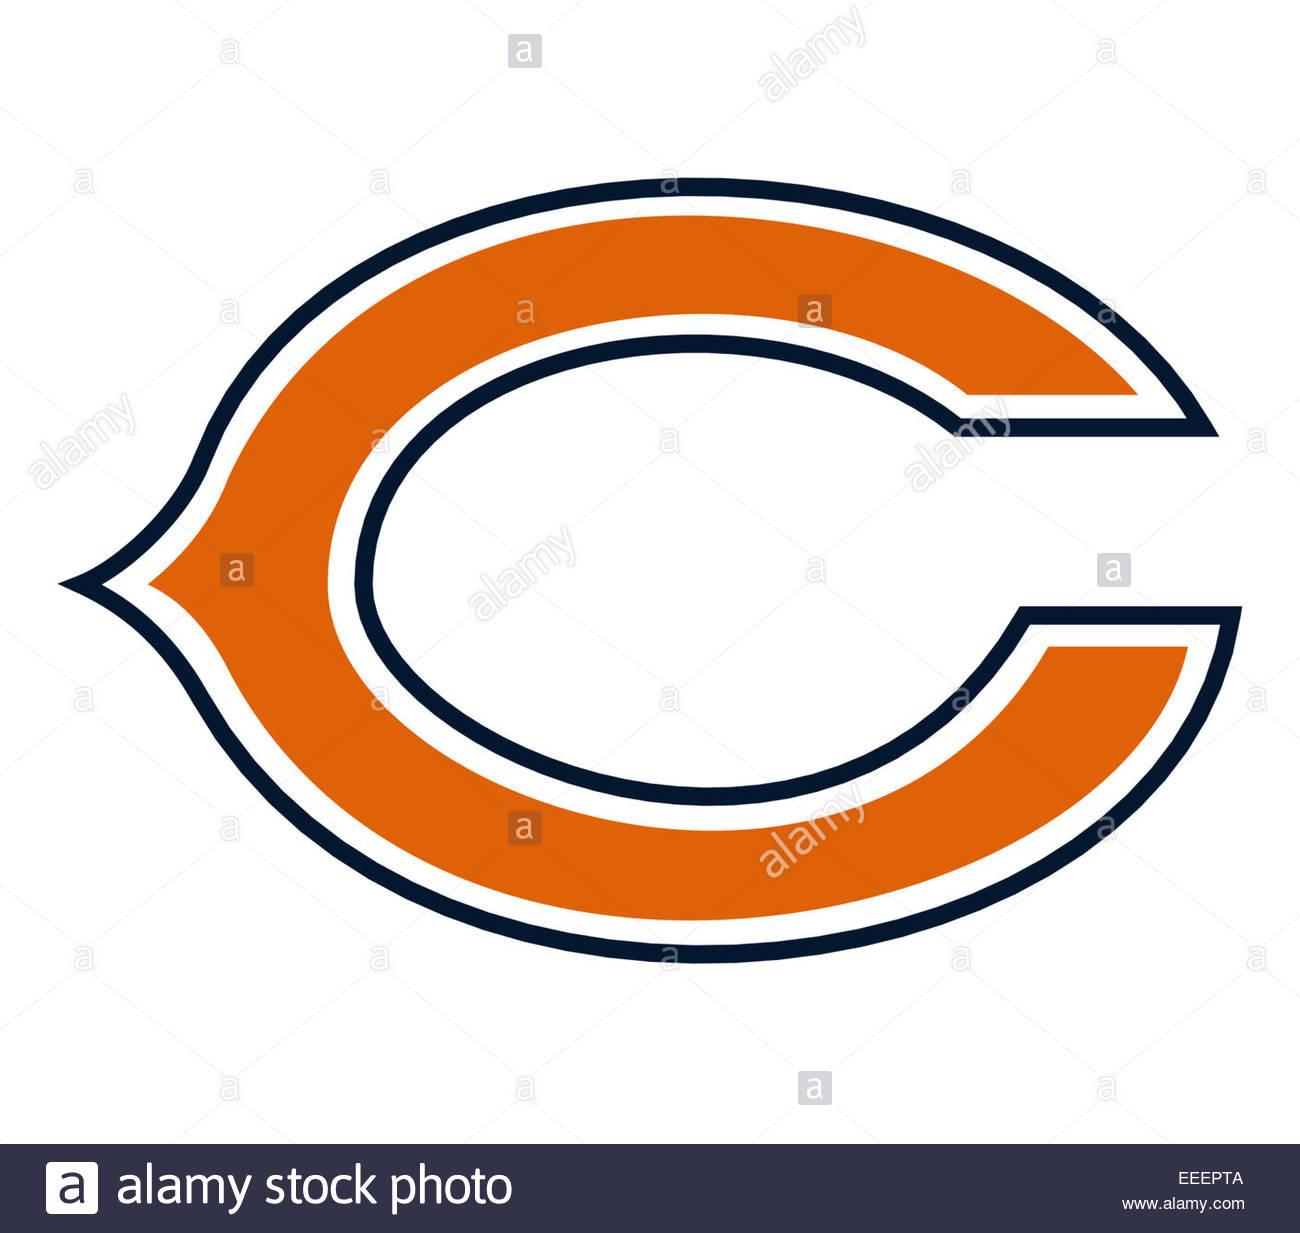 Chicago Bears logo icon symbol Stock Photo: 77771914 - Alamy